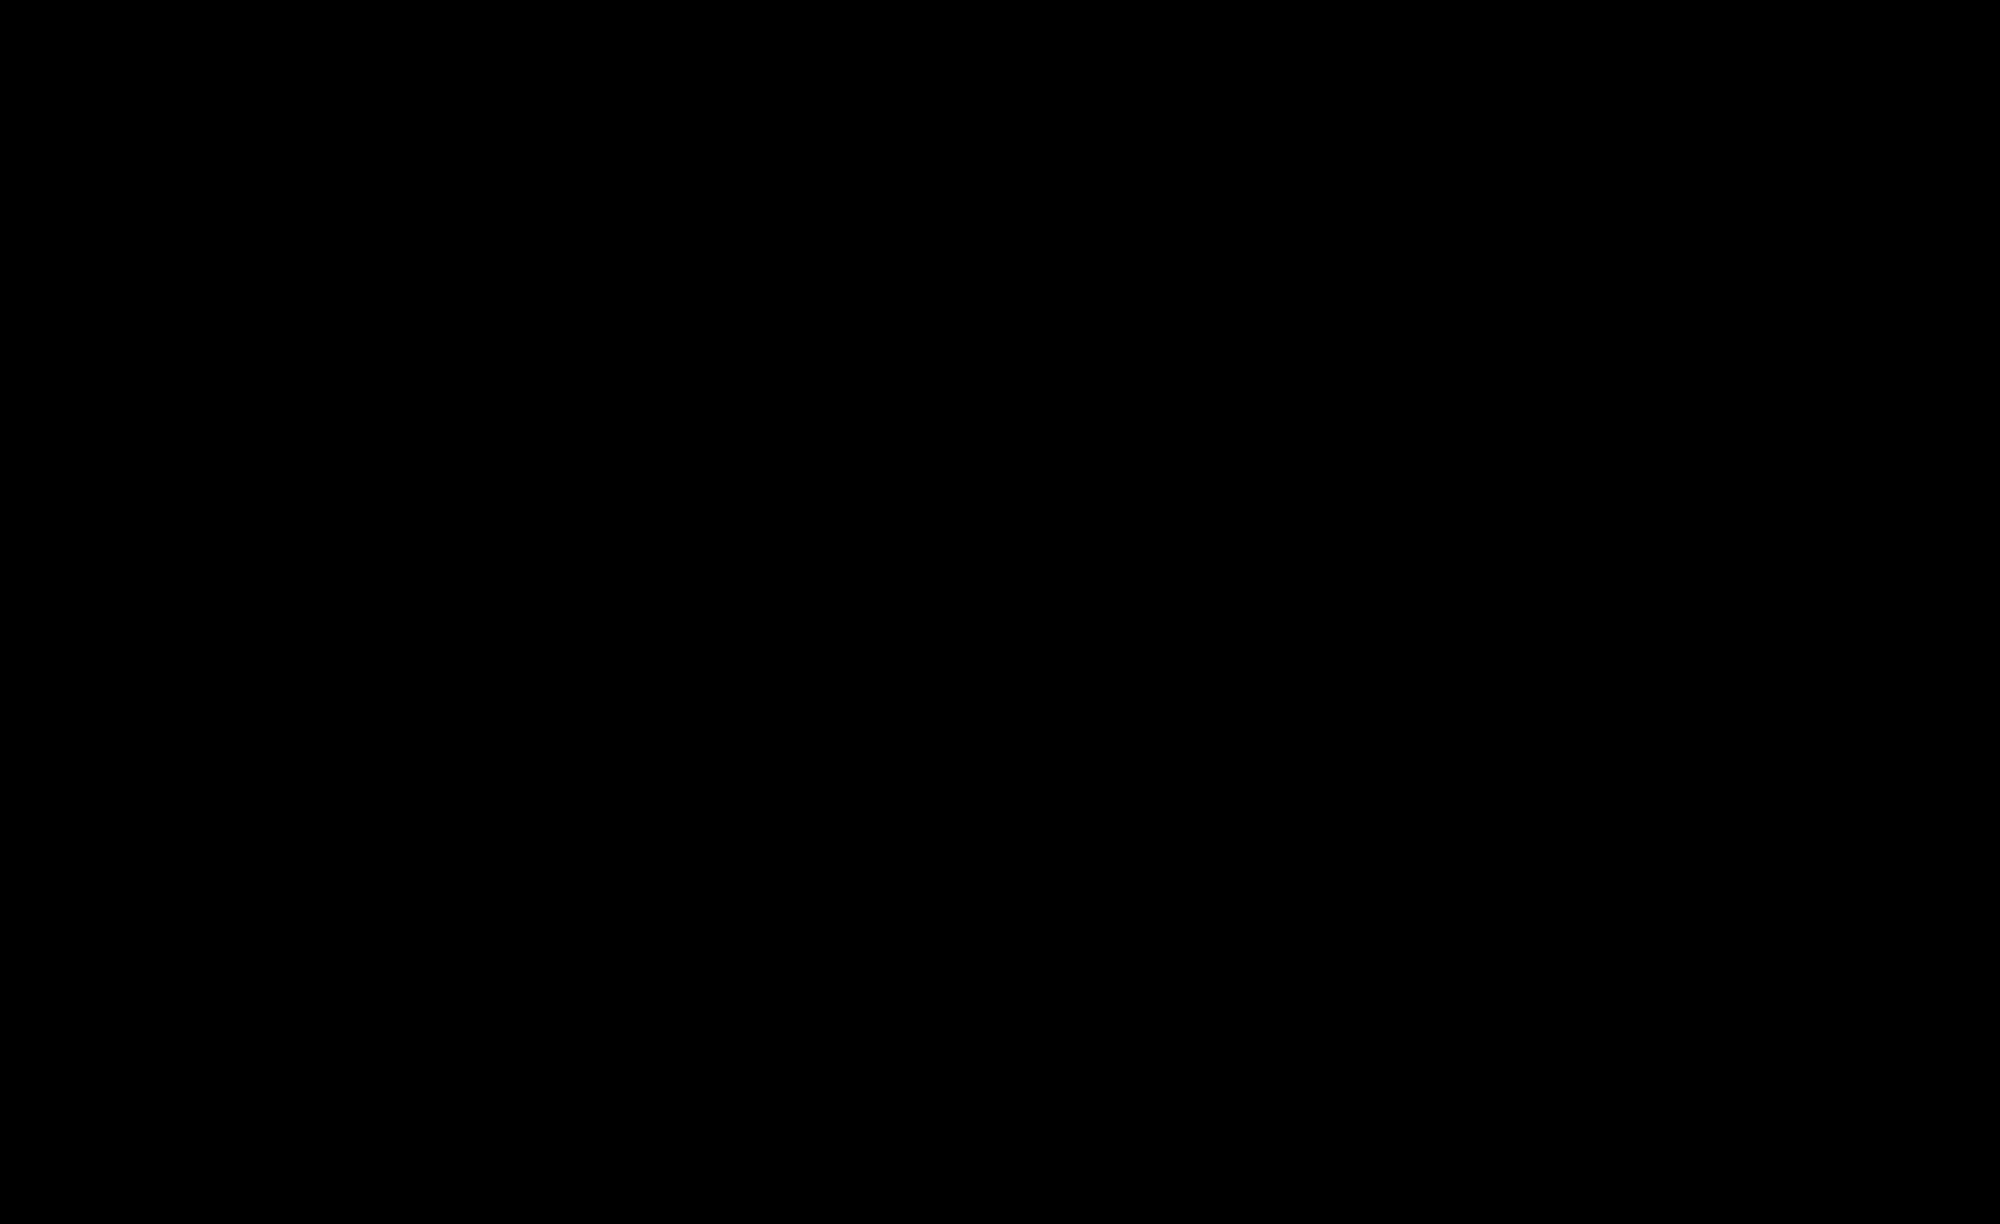 Id logo png 2 » PNG Image.